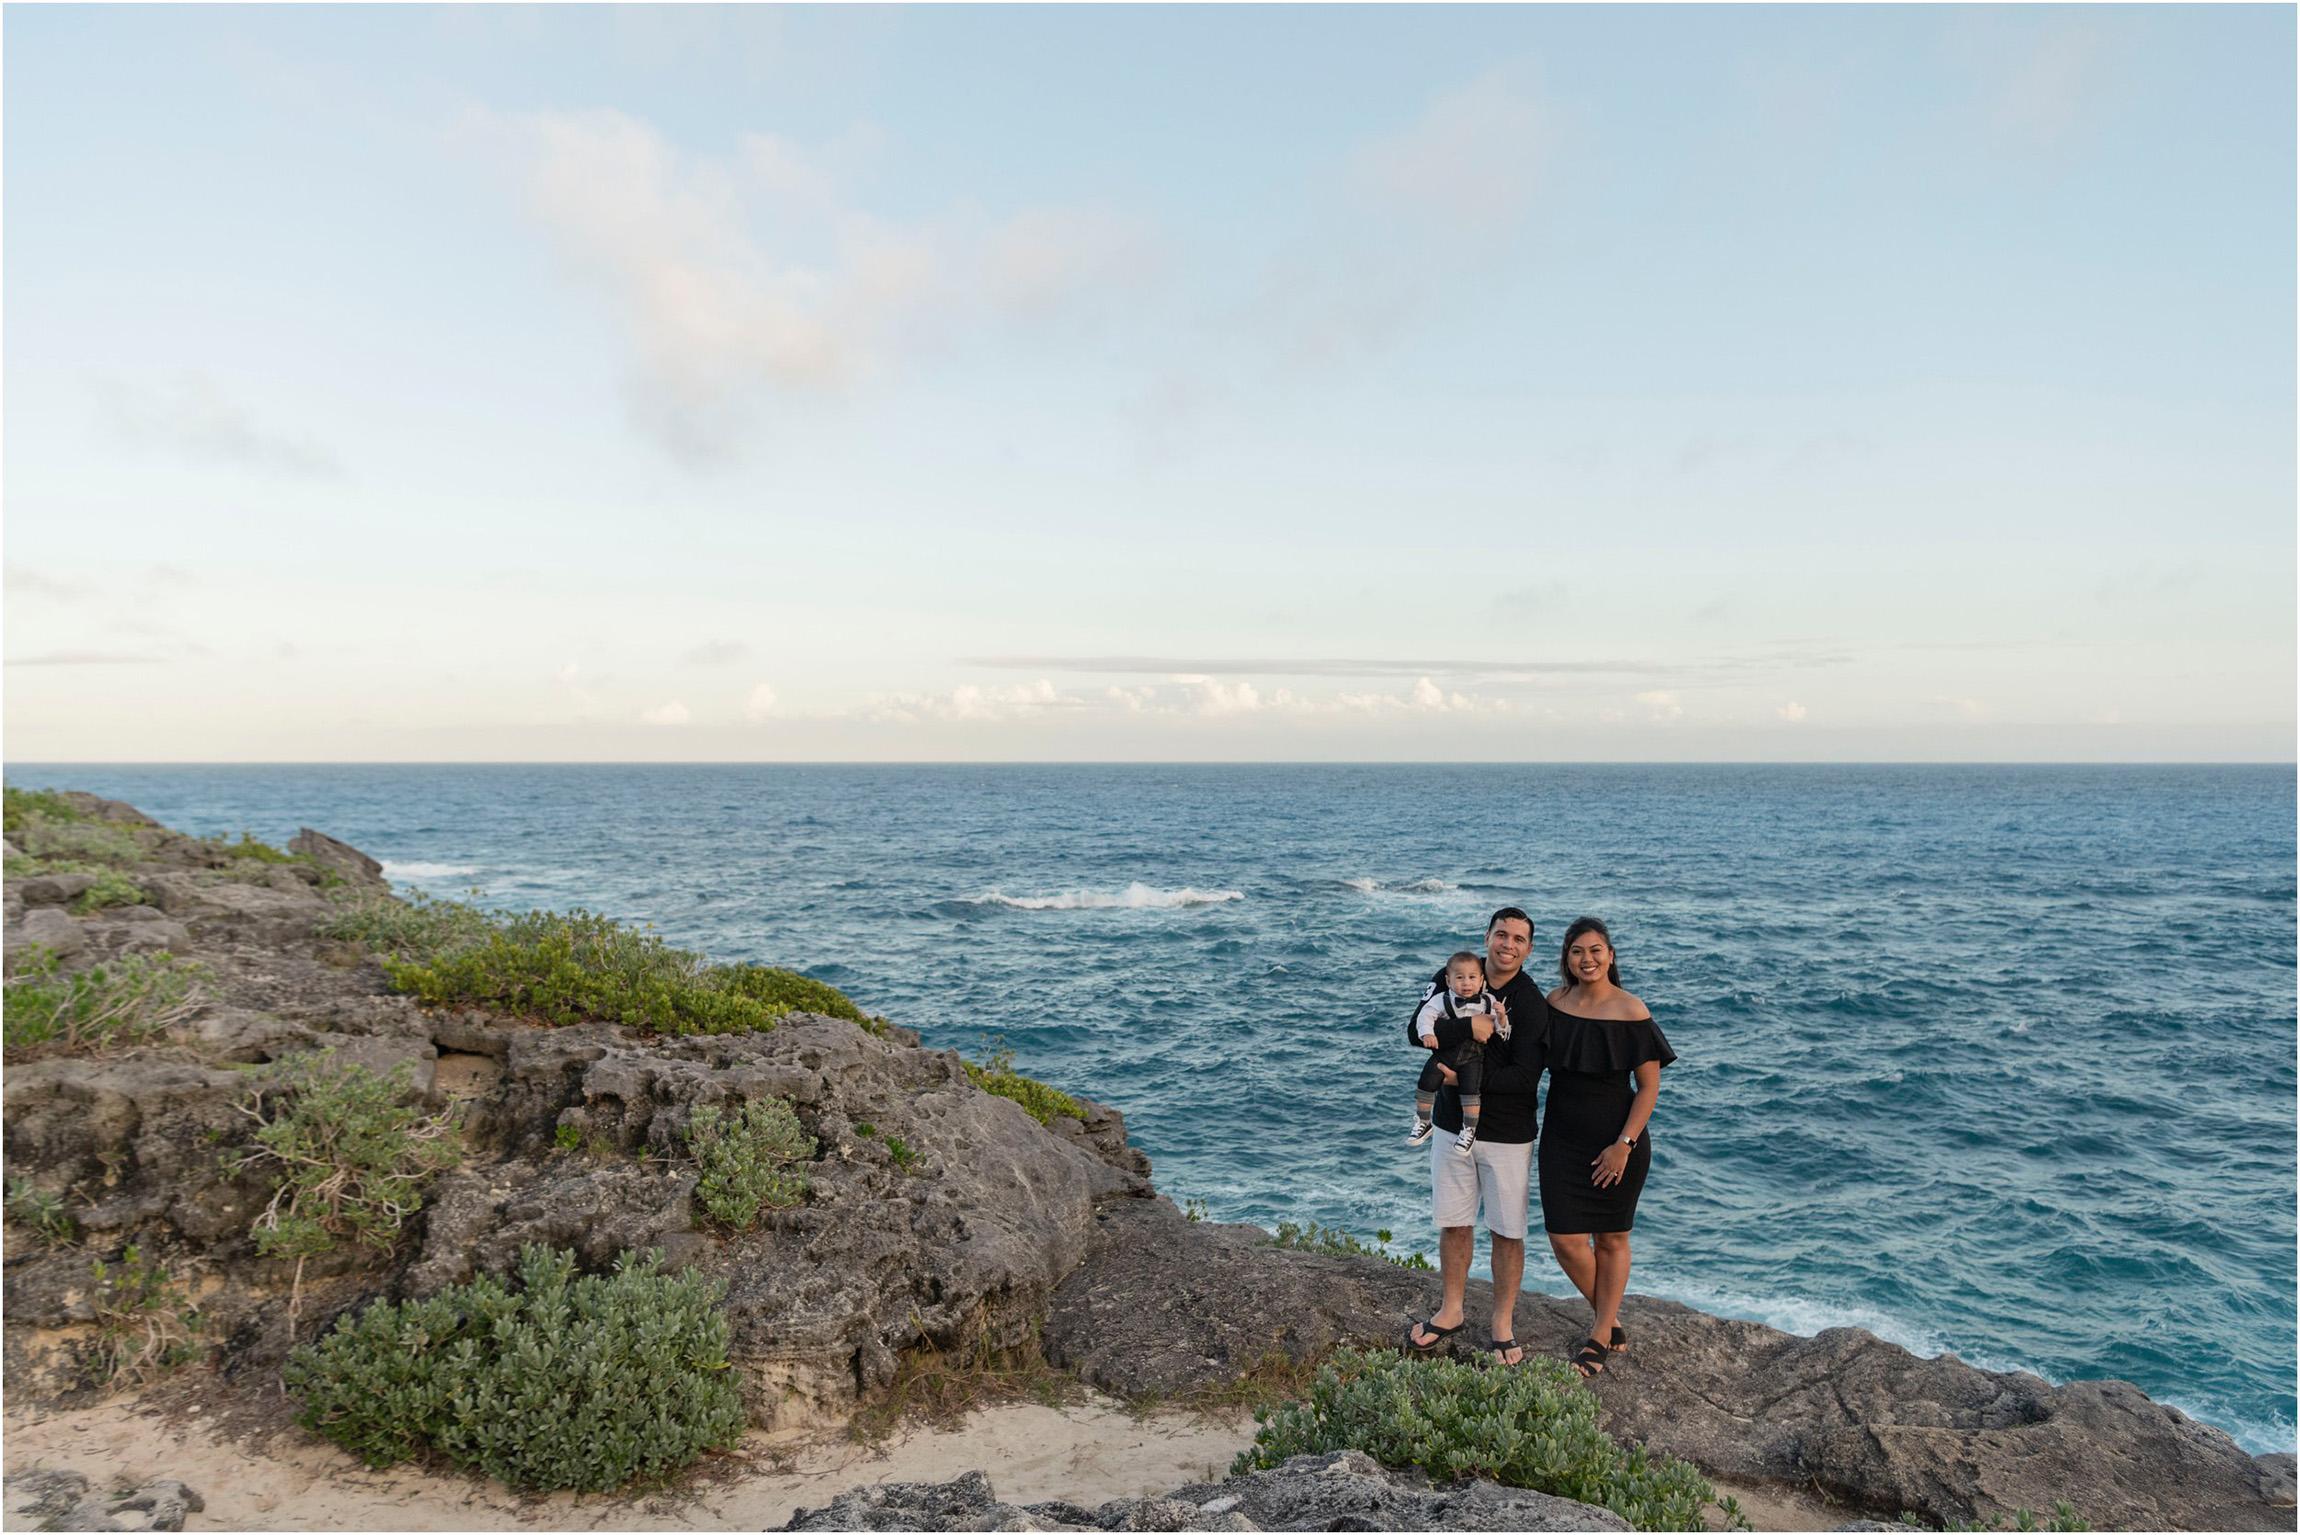 ©FianderFoto_Bermuda Photographer_Spittal Pond_The Loren_Thavrie_006.jpg